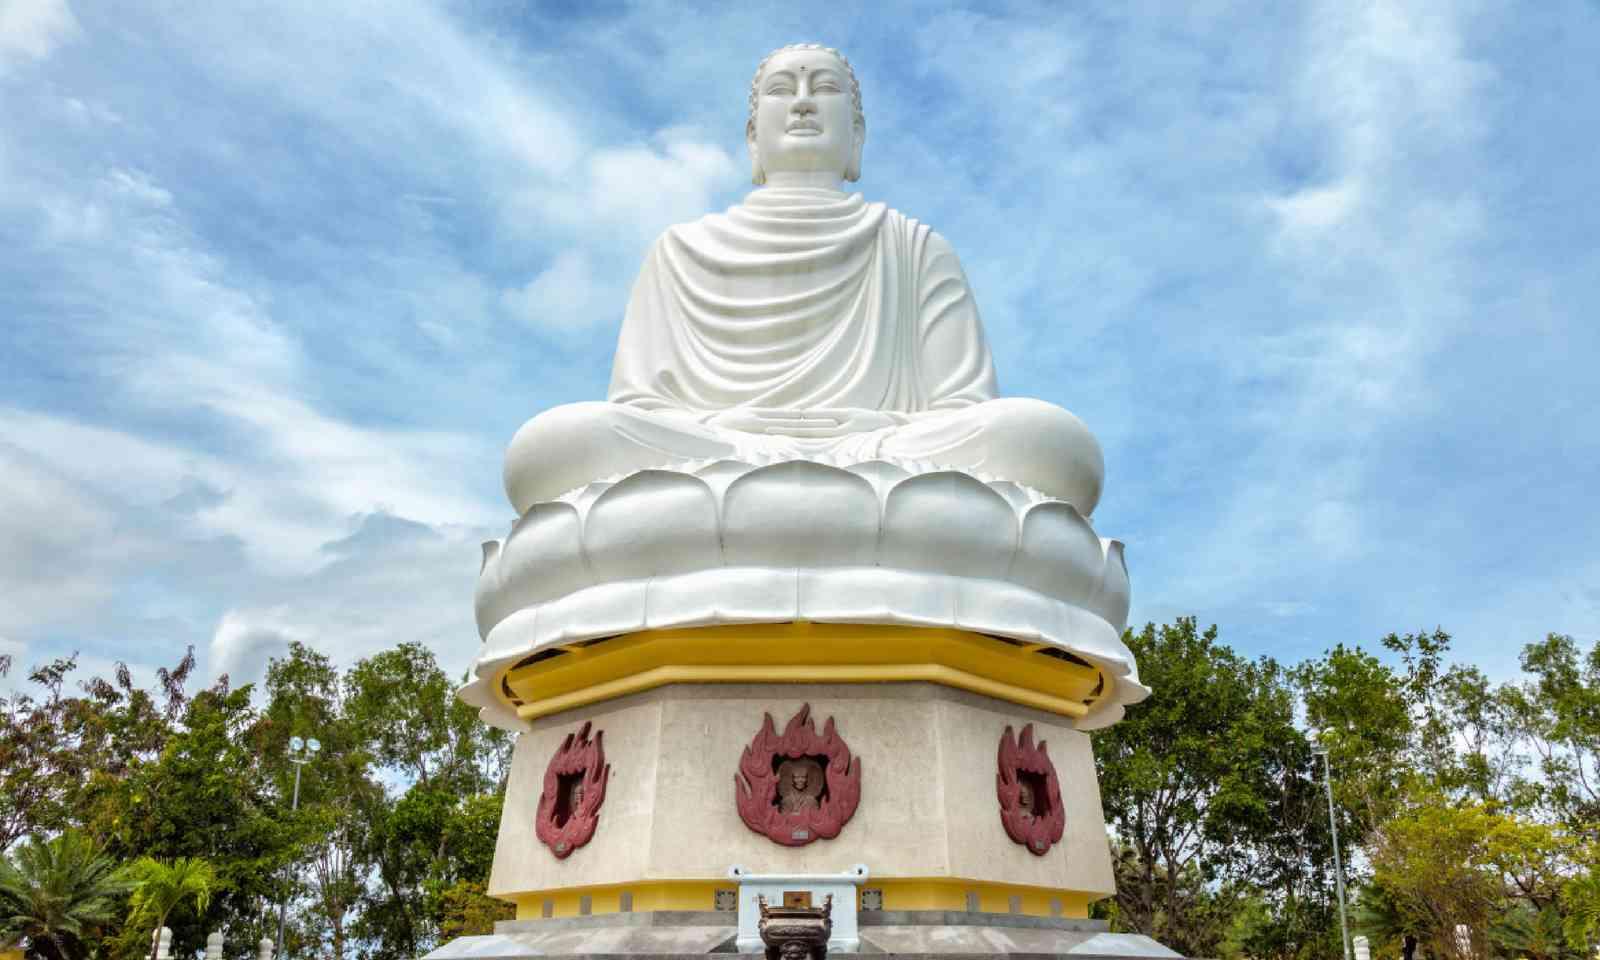 Buddha statue at the Long Son pagoda in Nha Trang (Shutterstock)